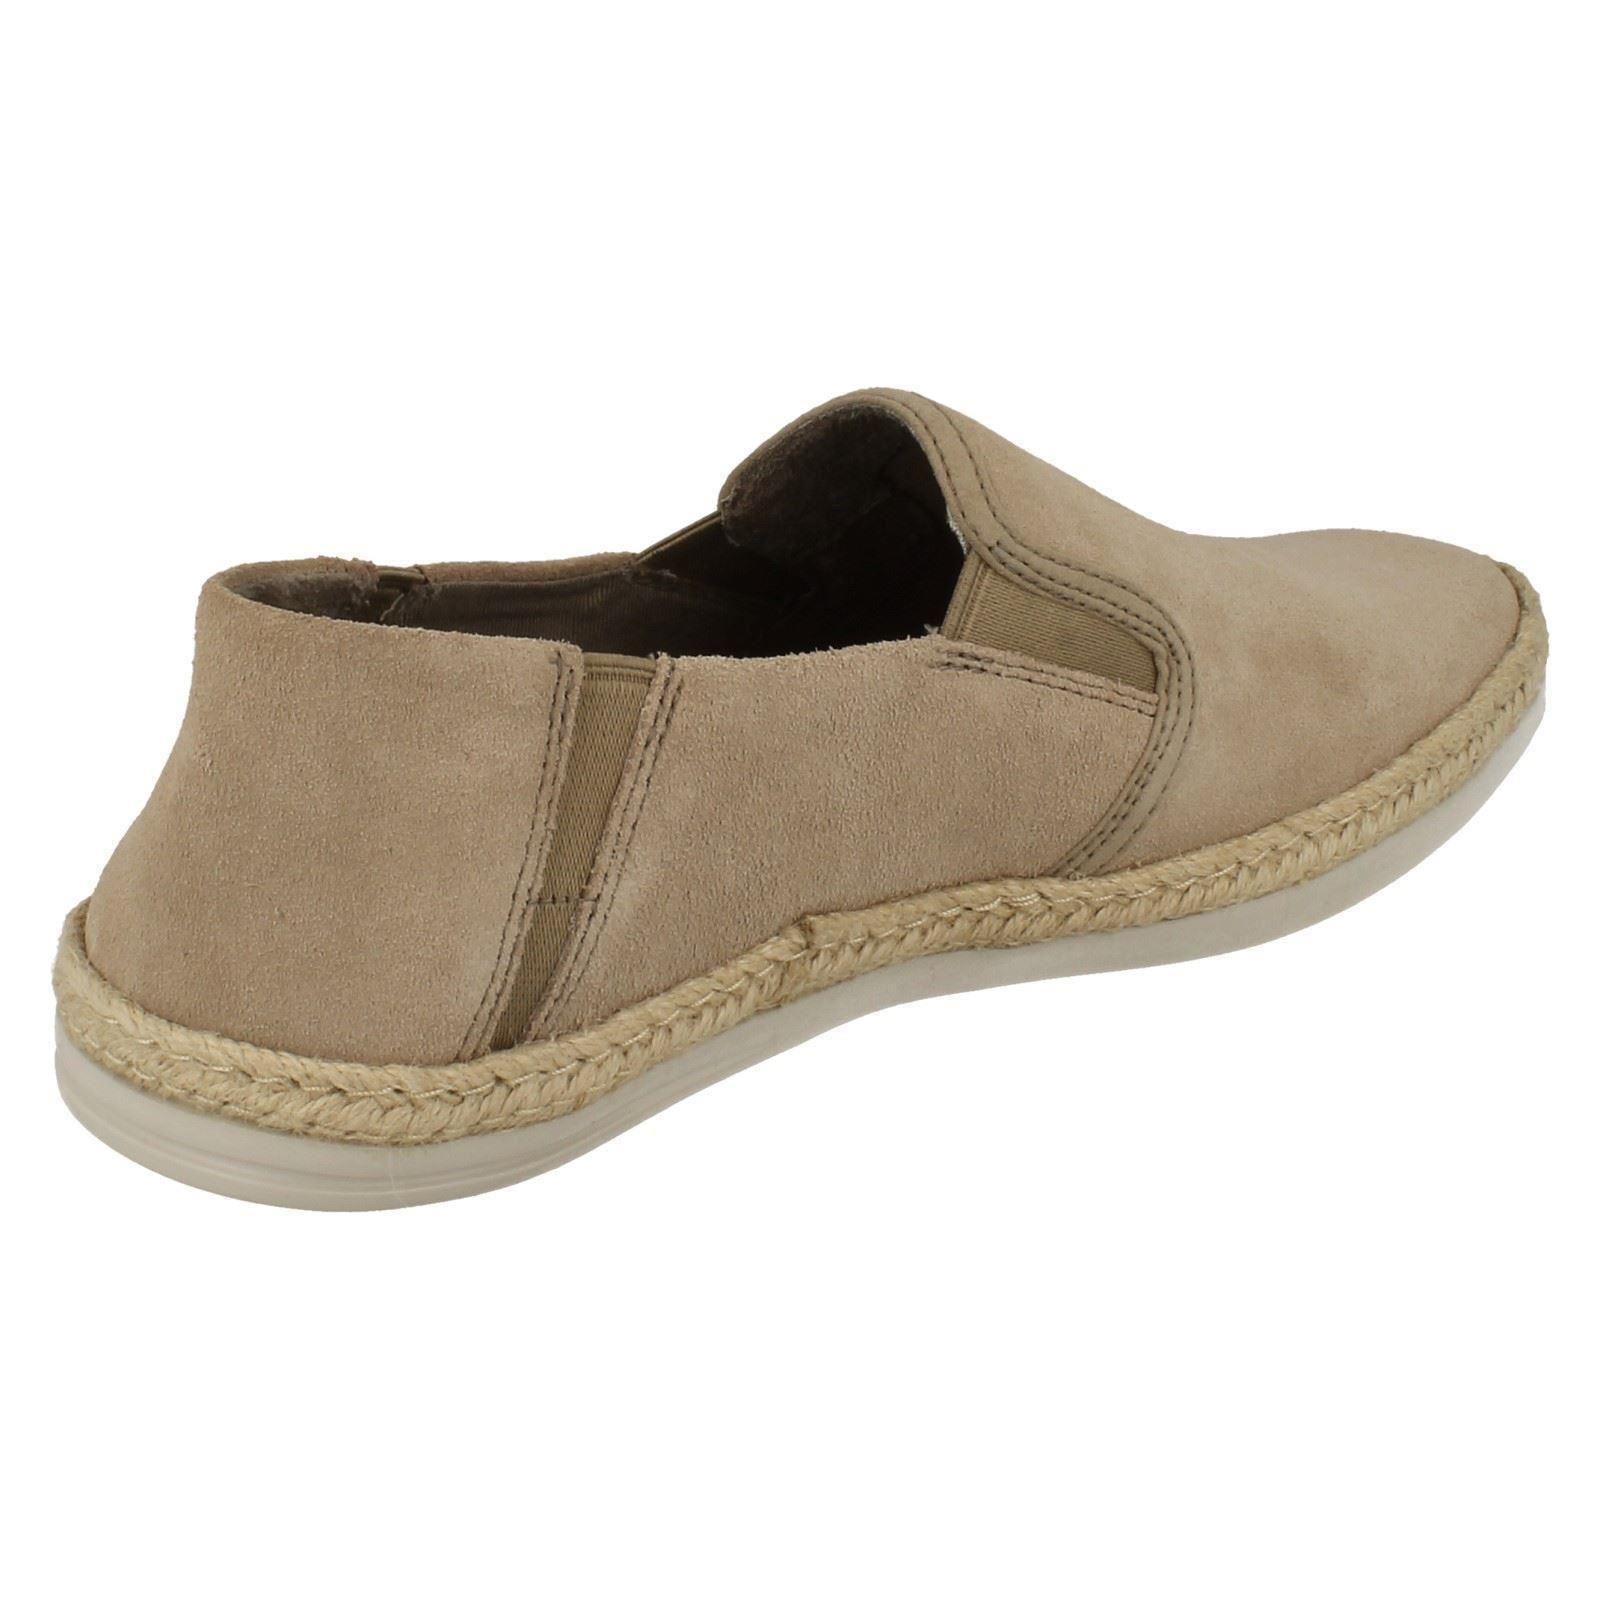 mens clarks suede leather slip on shoes bota step ebay